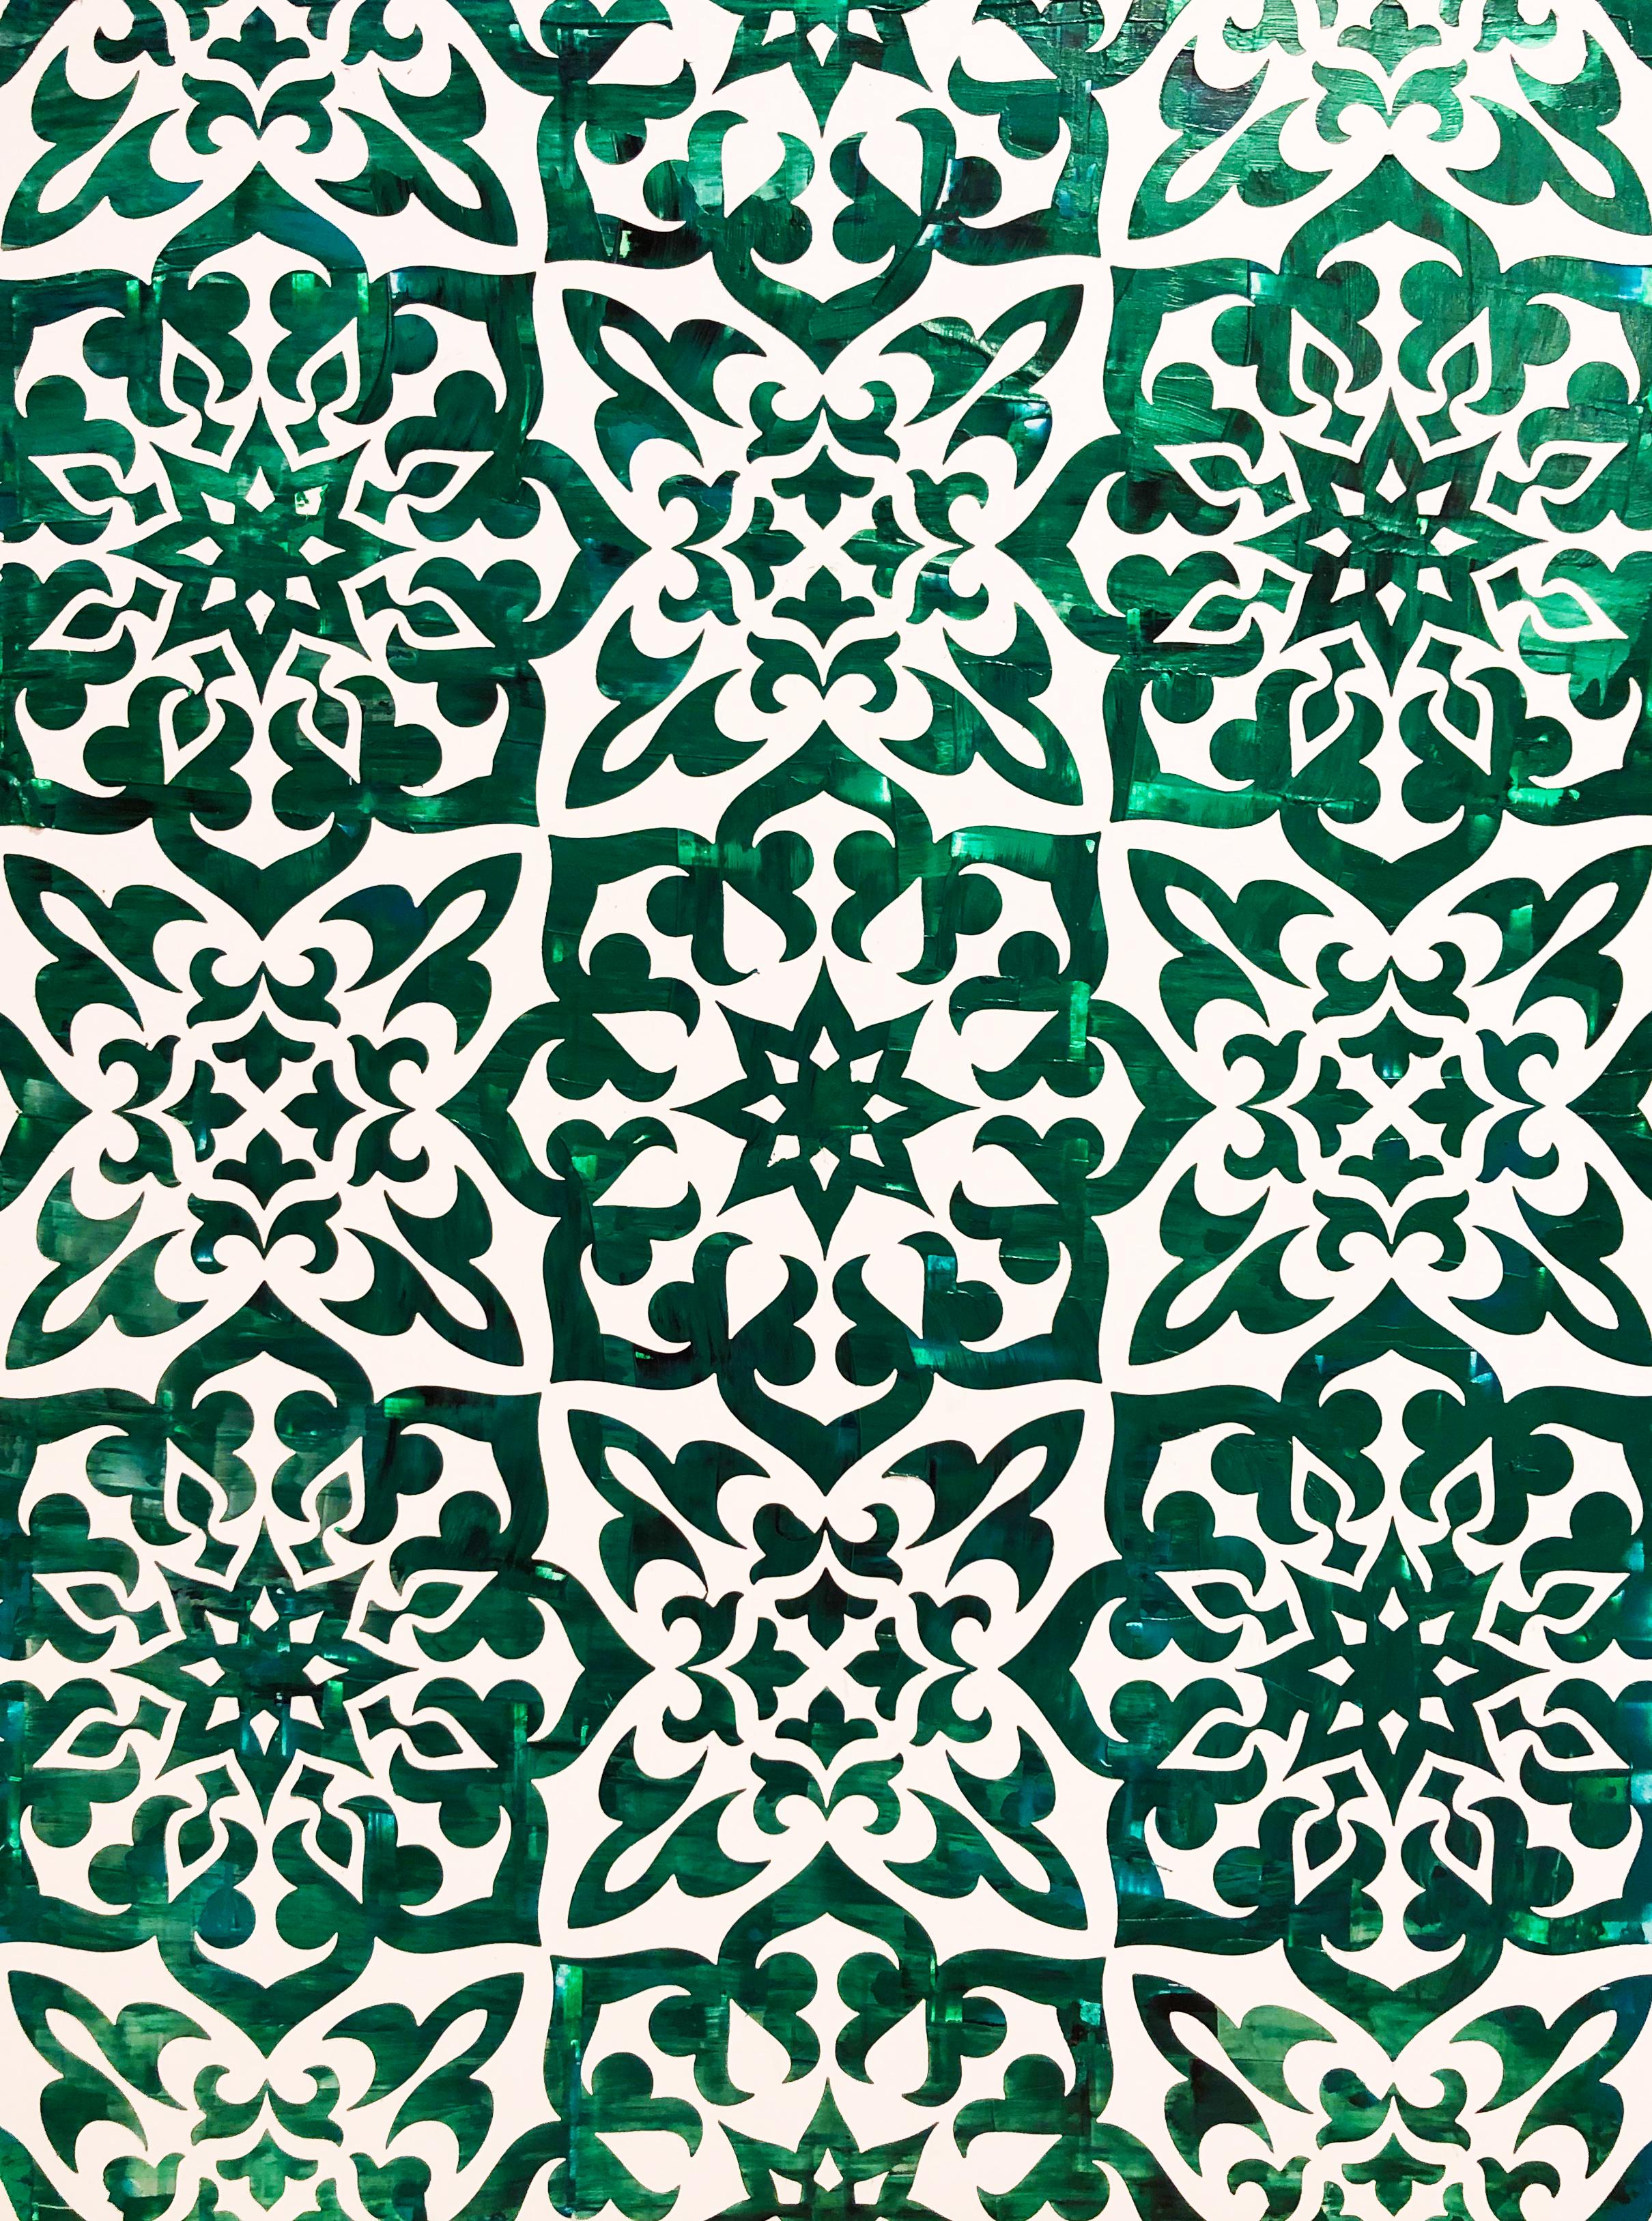 HUE Gallery of Contemporary Art - Sean Christopher Ward - Islamic Nights- Acrylic on MDF - 12x16 - 2018 - $450.JPG